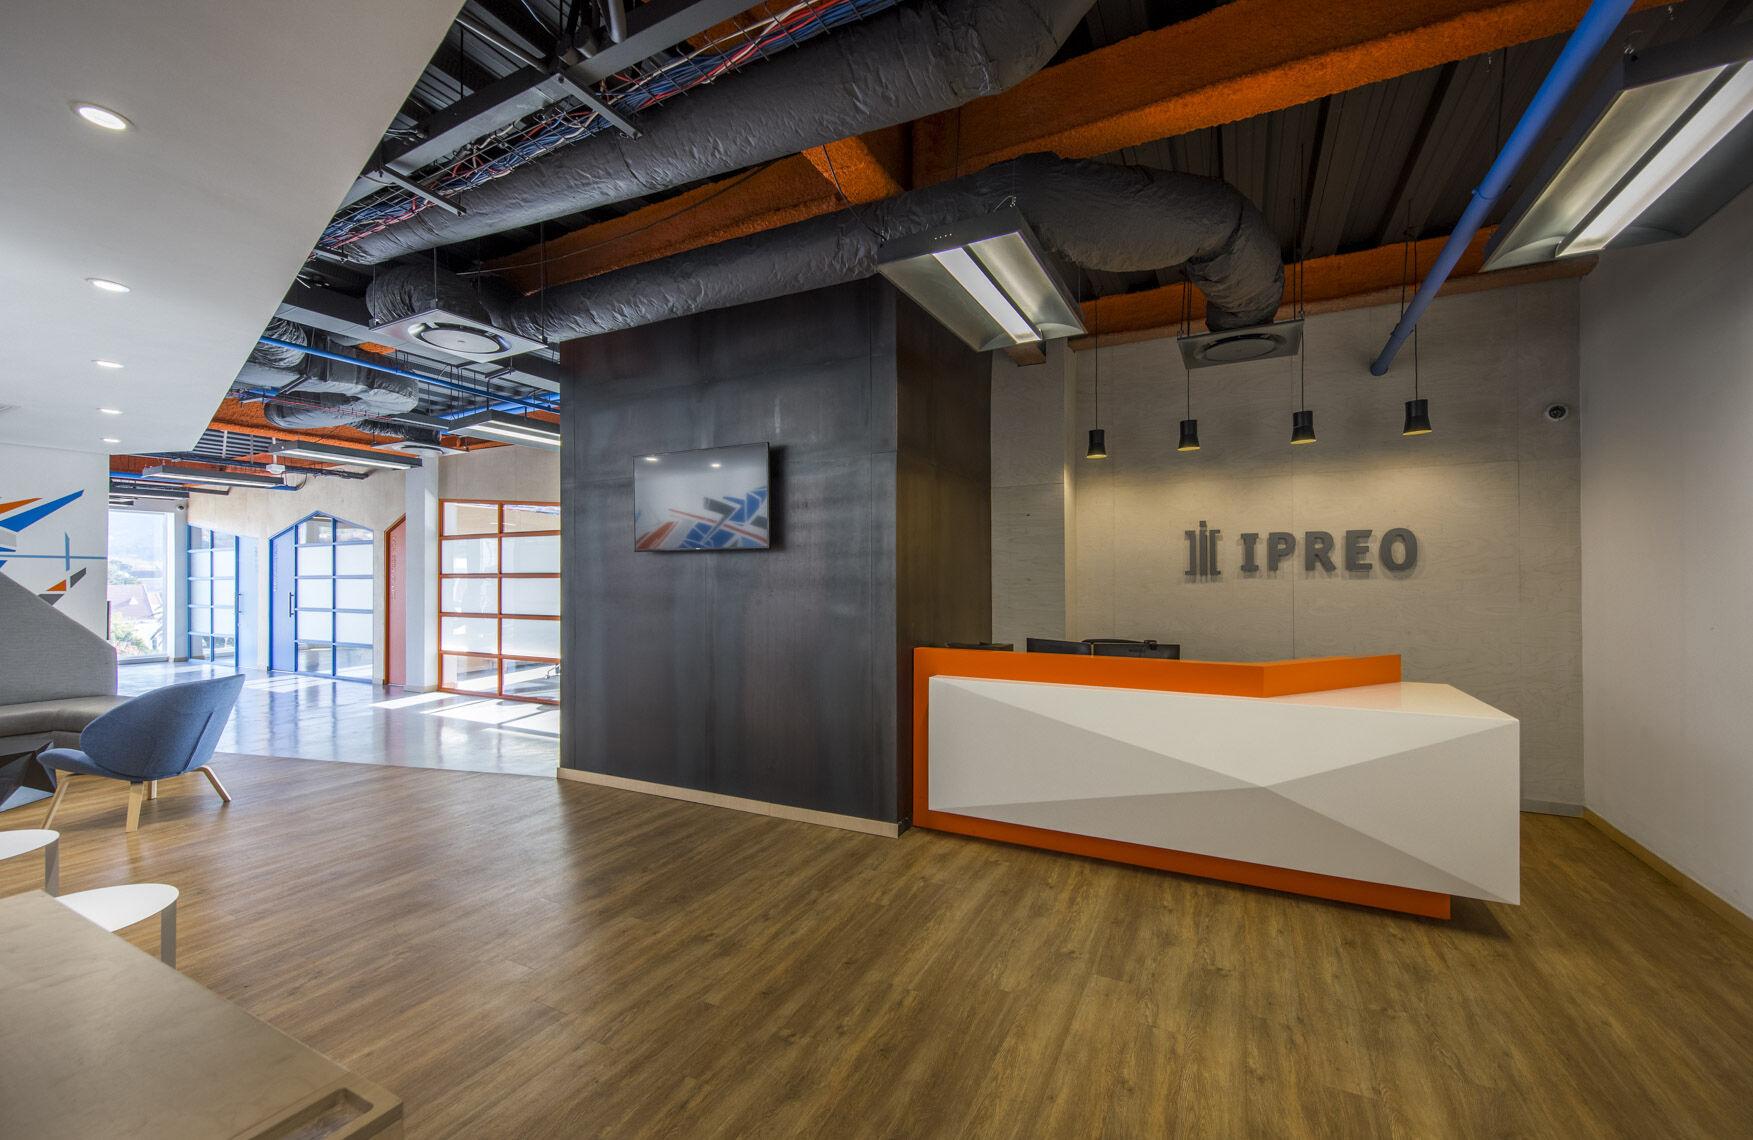 IP4 - Ipreo  (1).jpg